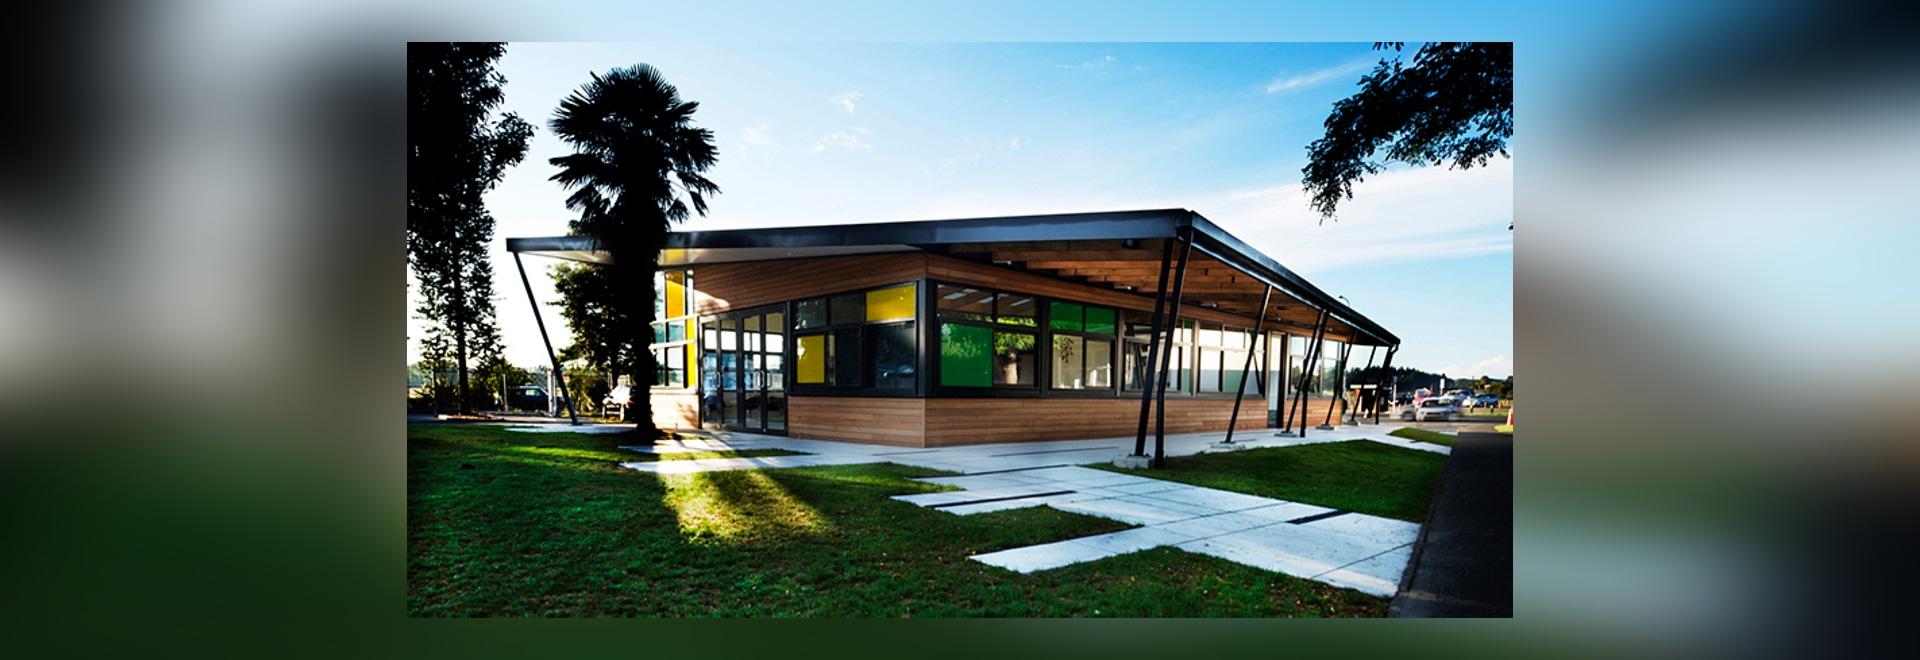 stephenson & turner re-imagine primary school admin building in auckland